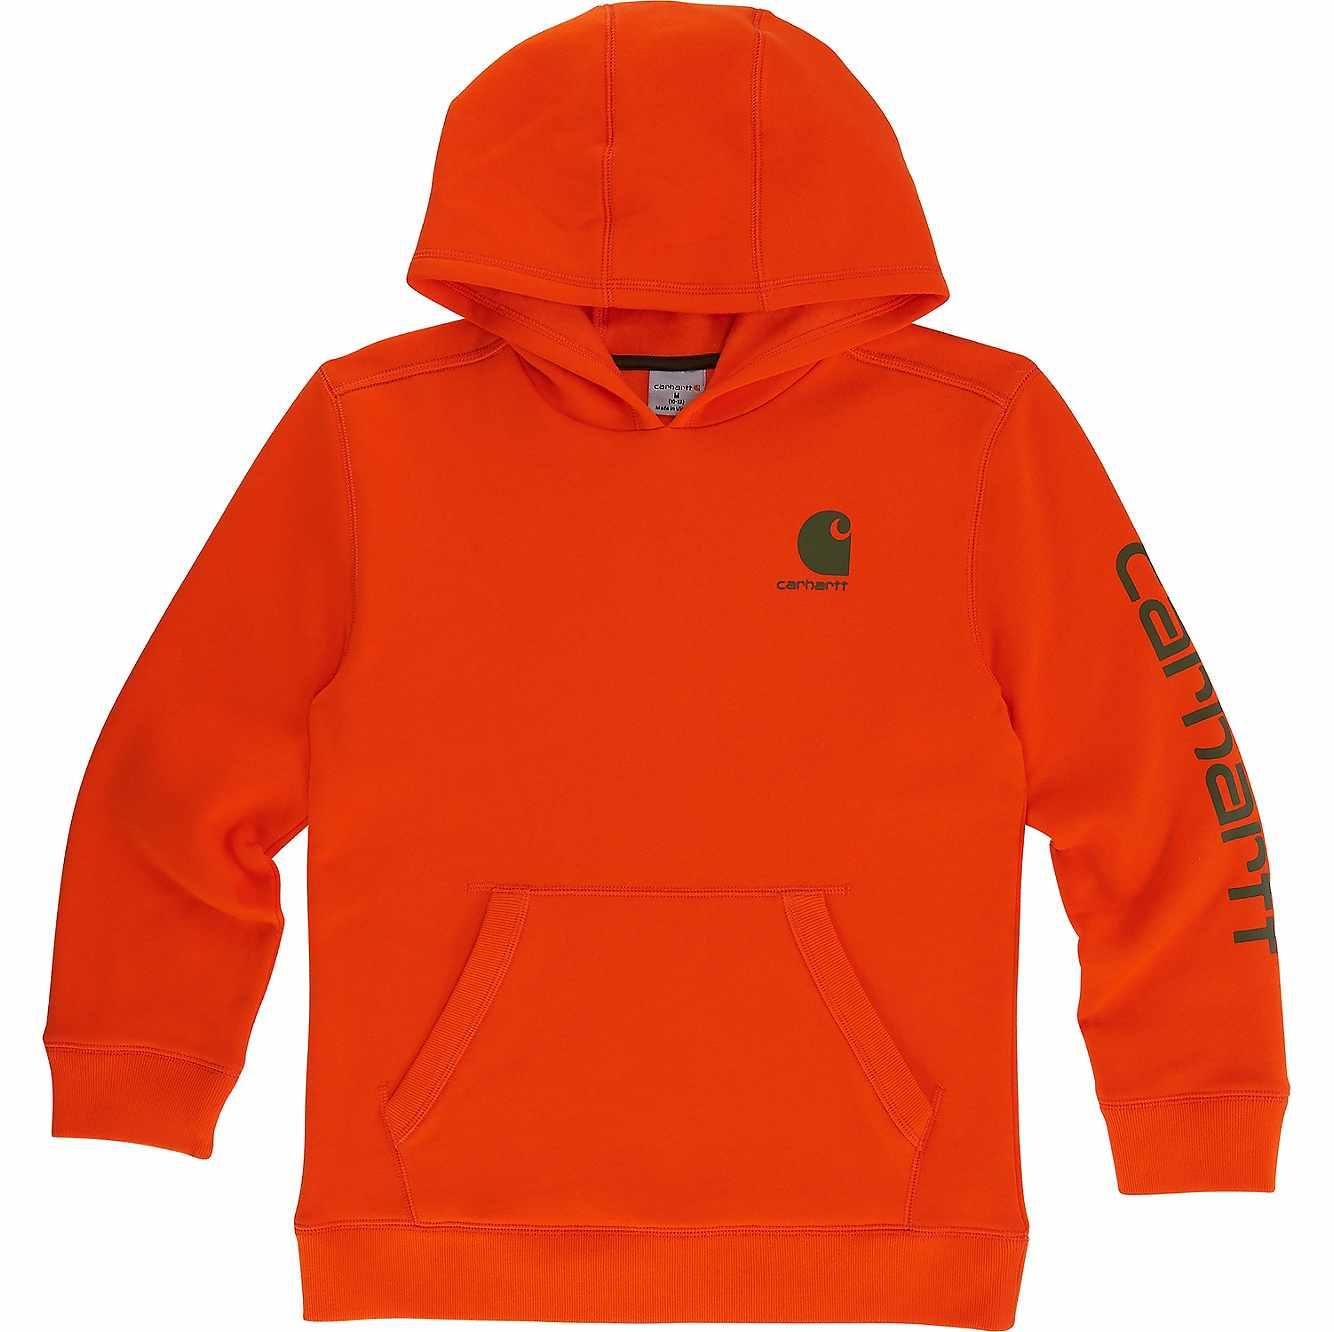 Picture of Signature Carhartt Sweatshirt in Blaze Orange